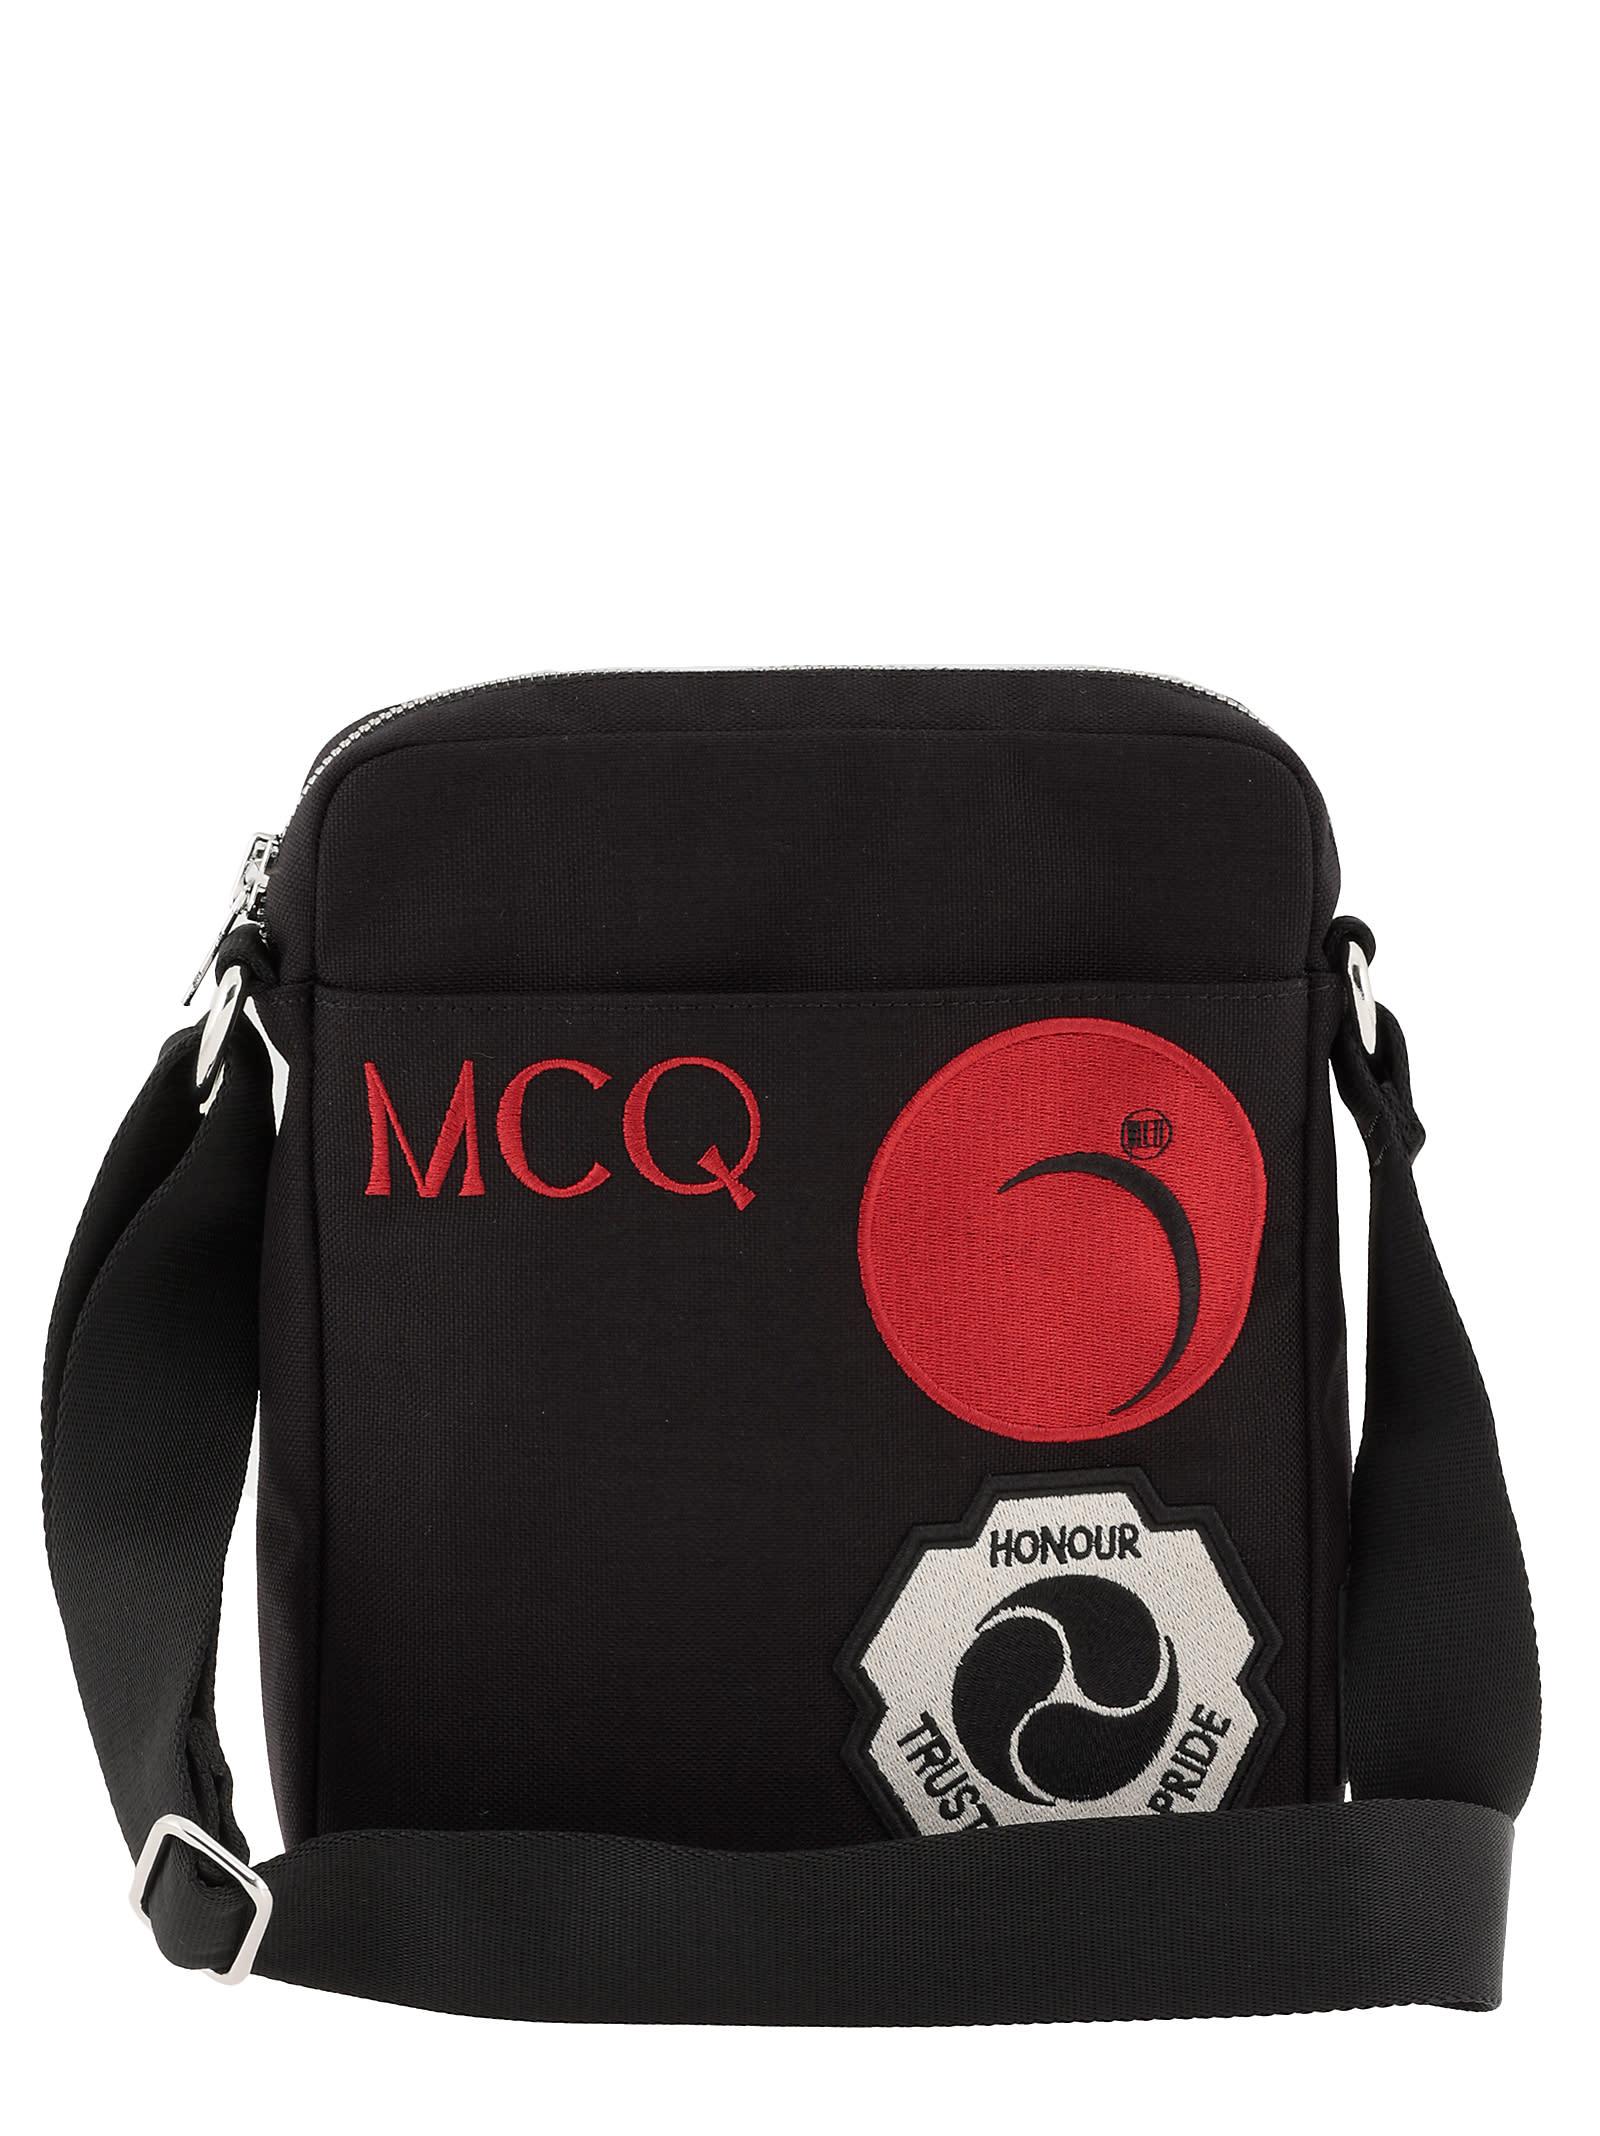 Mcq By Alexander Mcqueen TECH FABRIC SHOULDER BAG